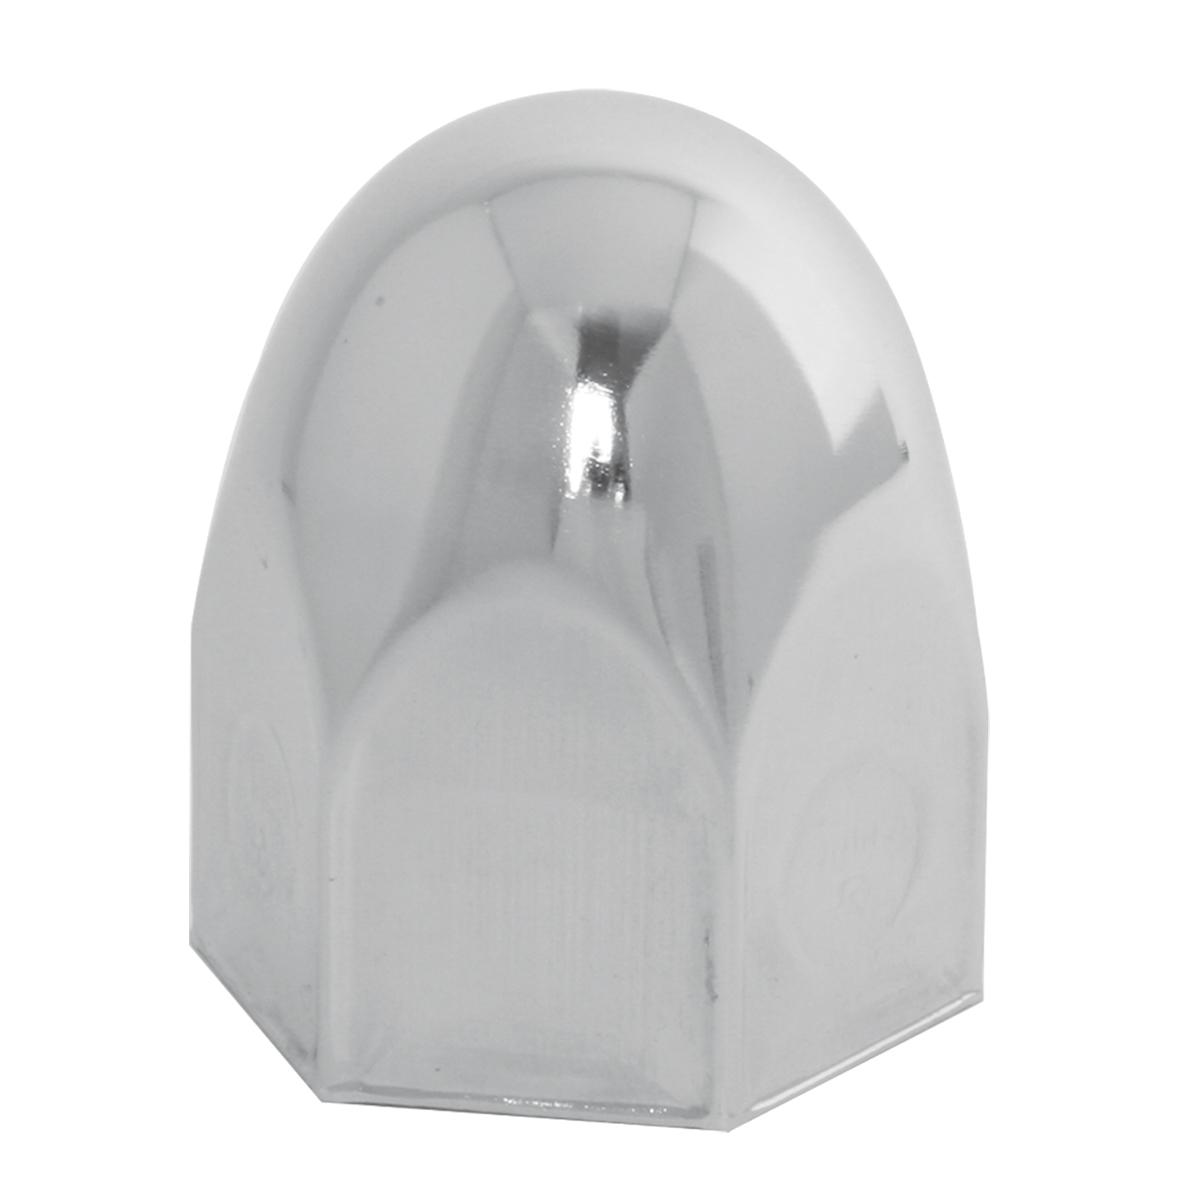 10038 Chrome Steel Push-On Bullet Style Lug Nut Cover w/o Flange